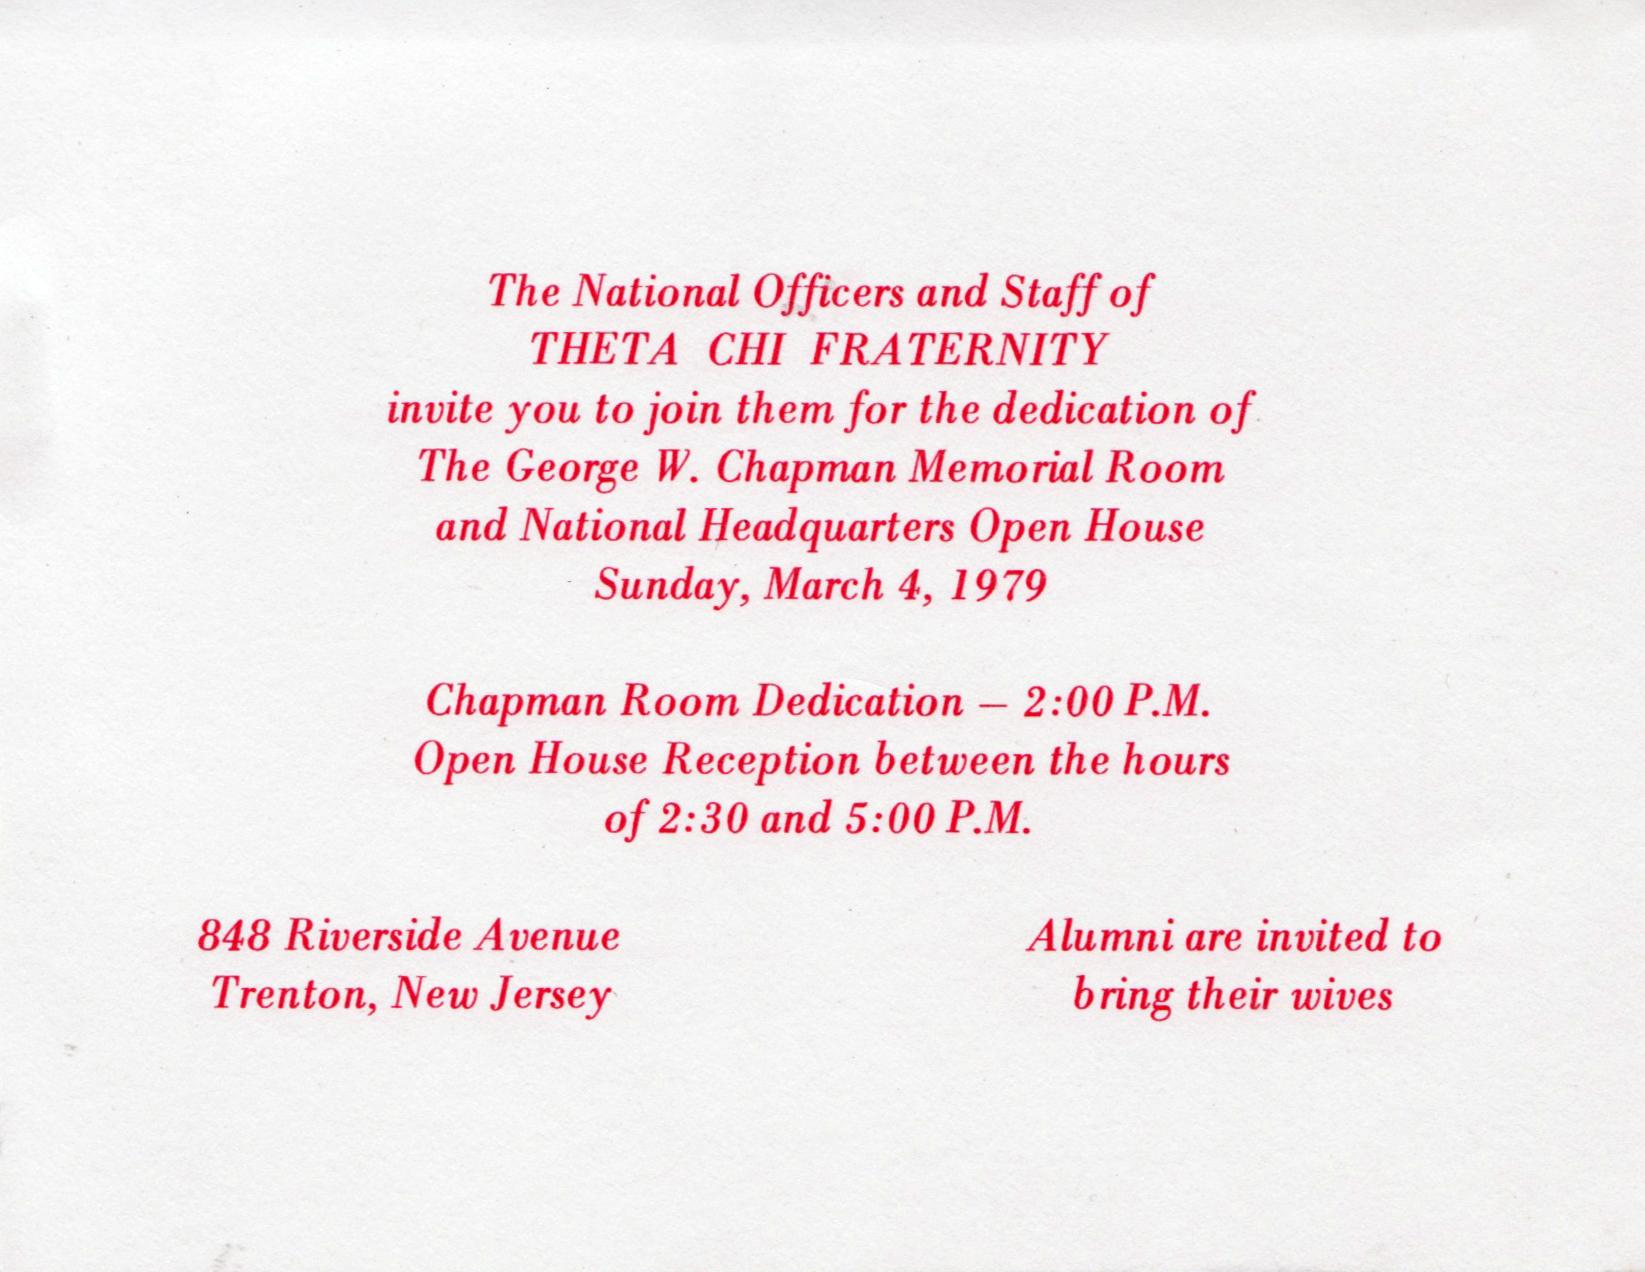 Chapman Room Dedication Invite - Inside